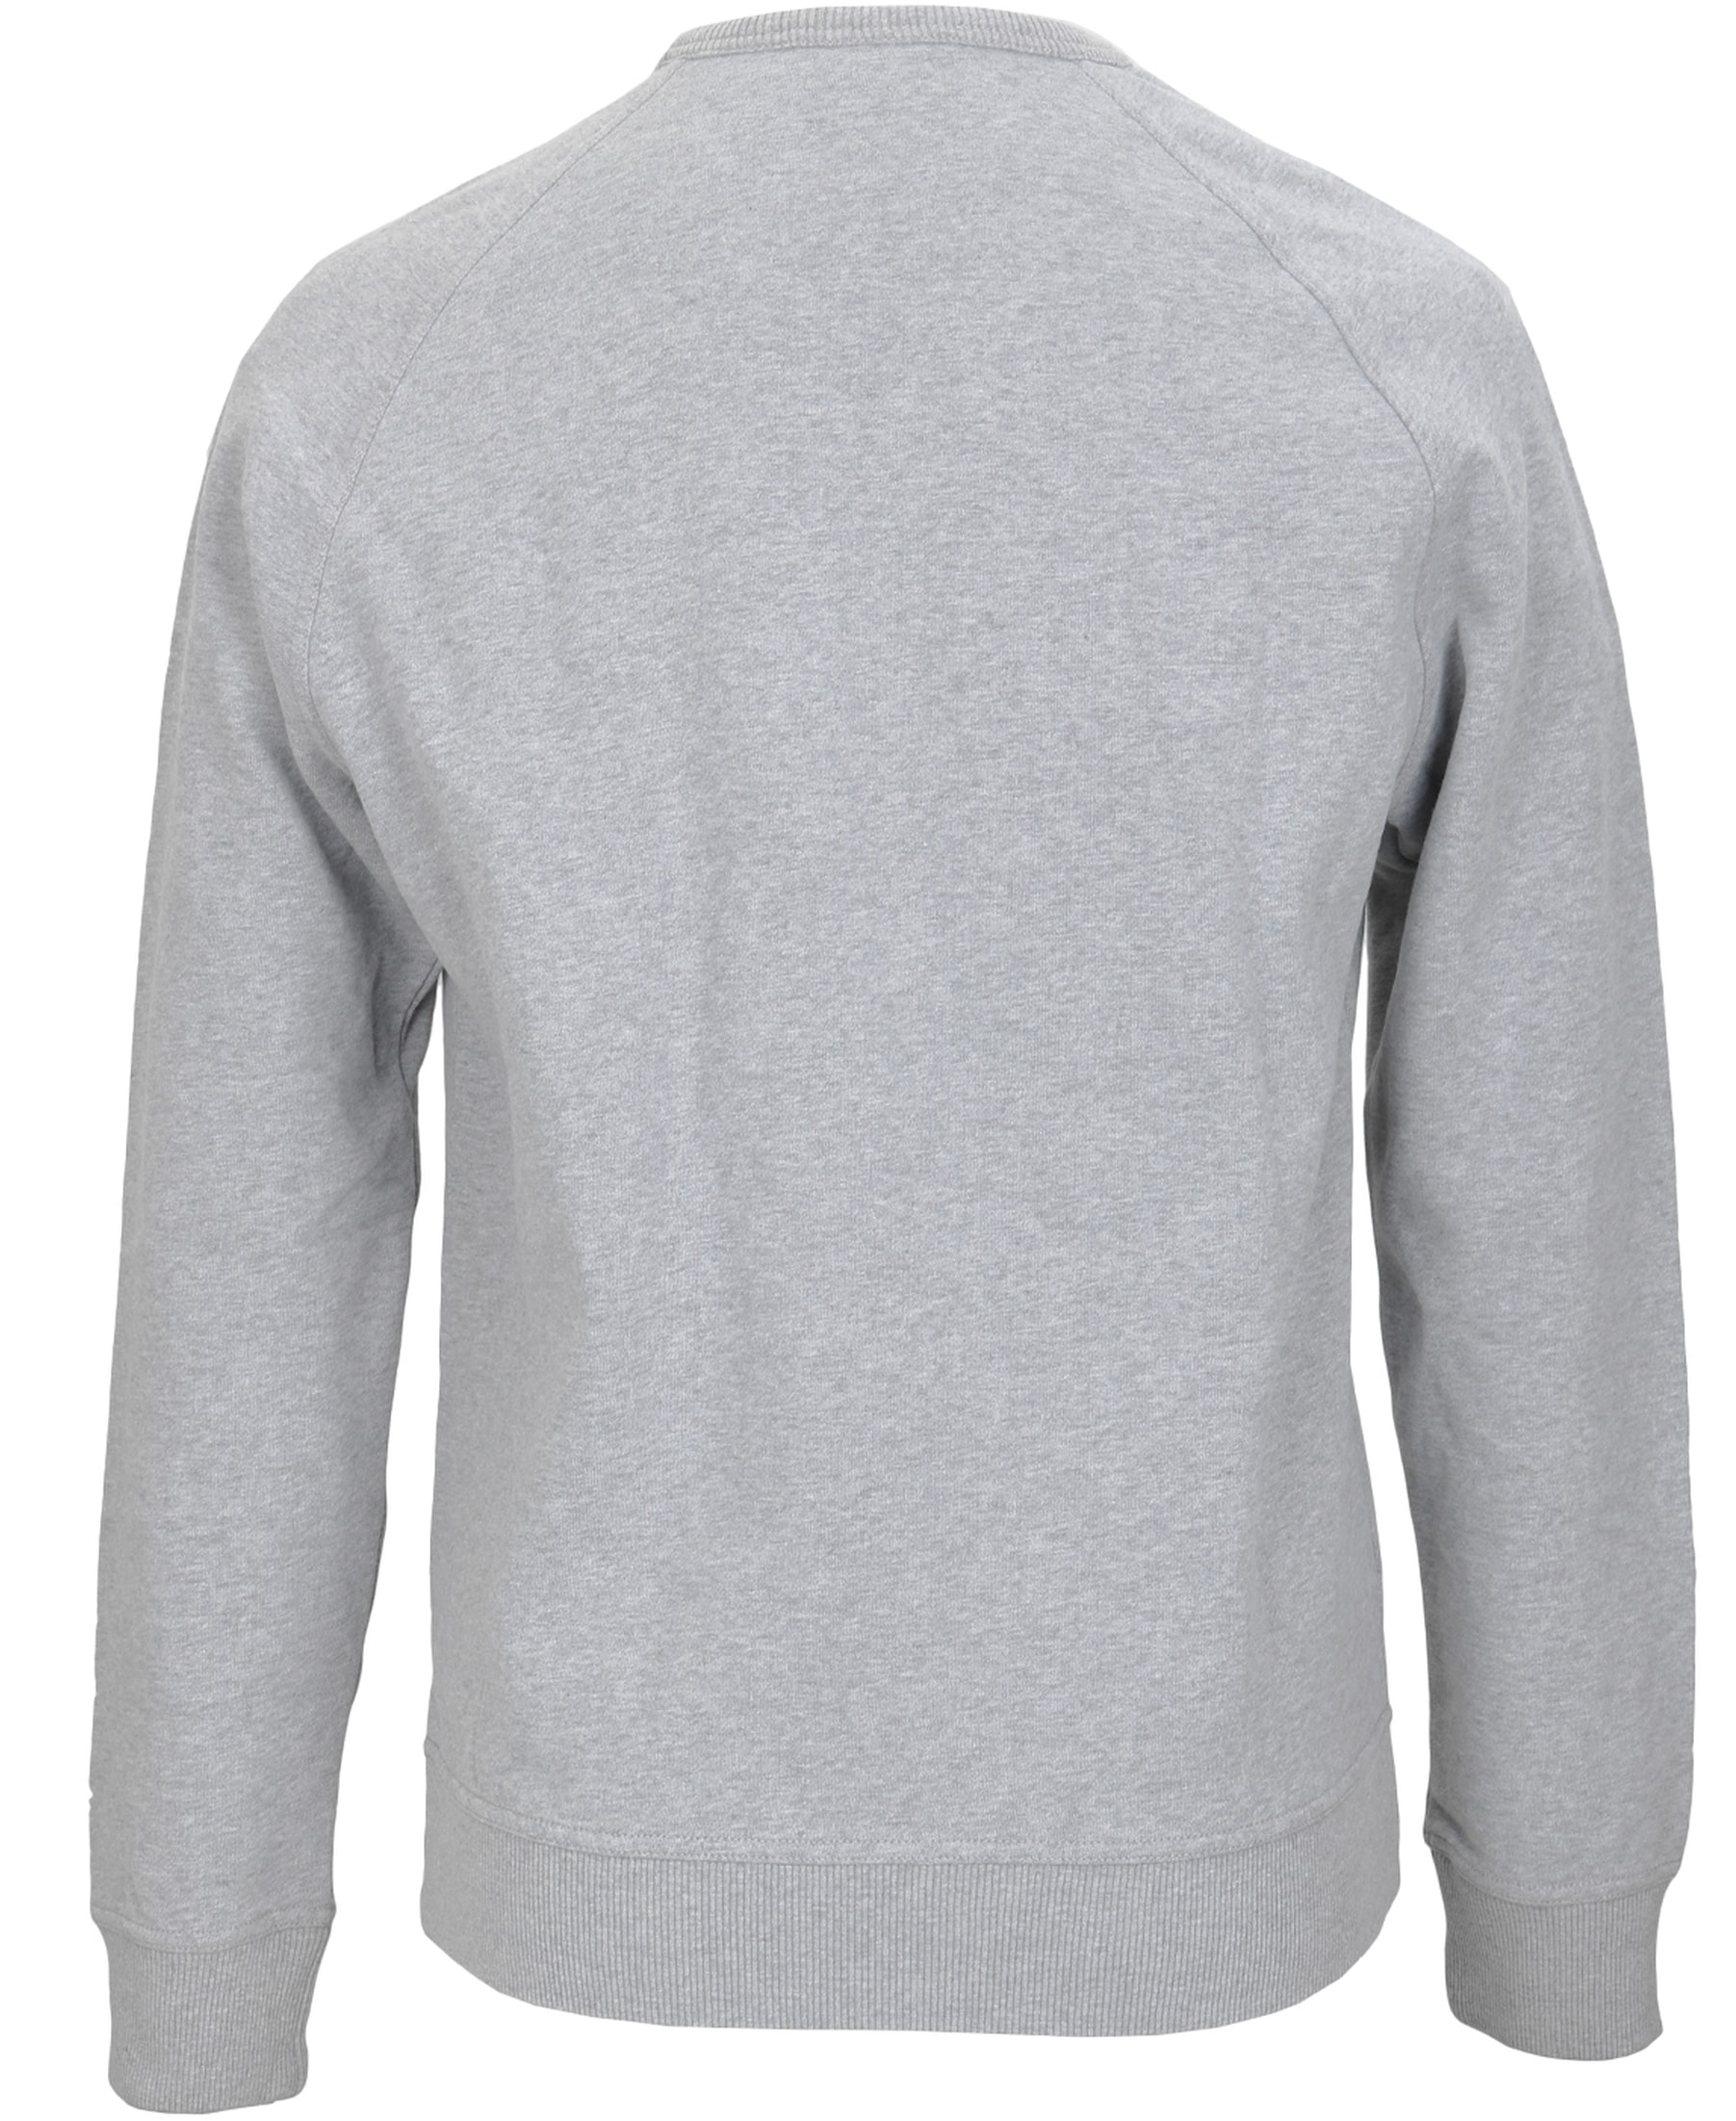 Timberland Sweater Grijs Raglan foto 2